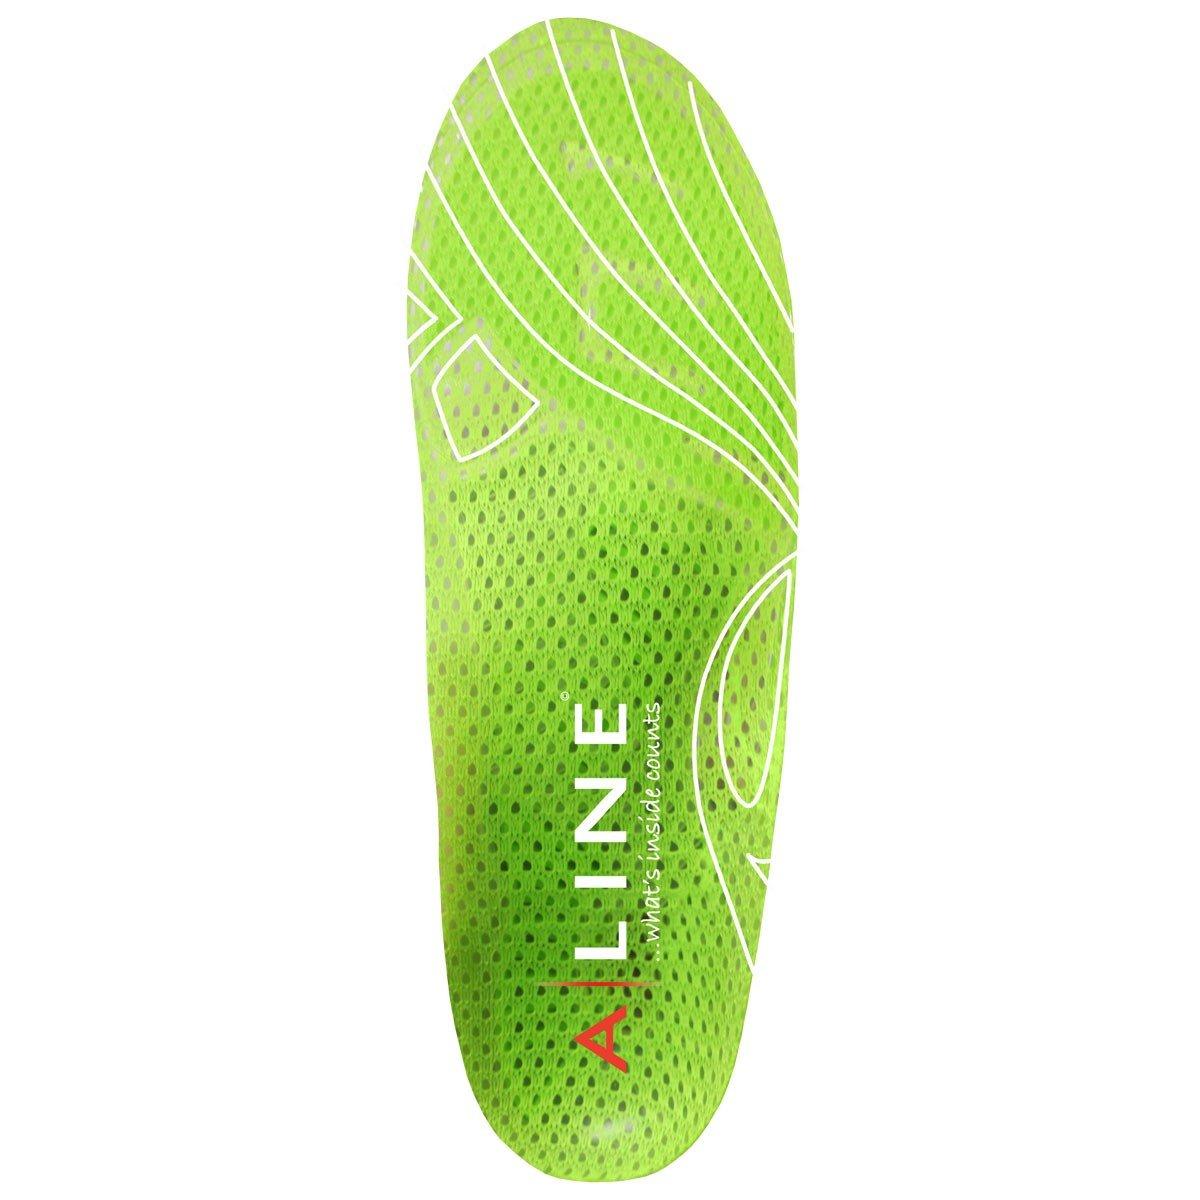 ALINE Shoe Insole, Size 8.0-9.0